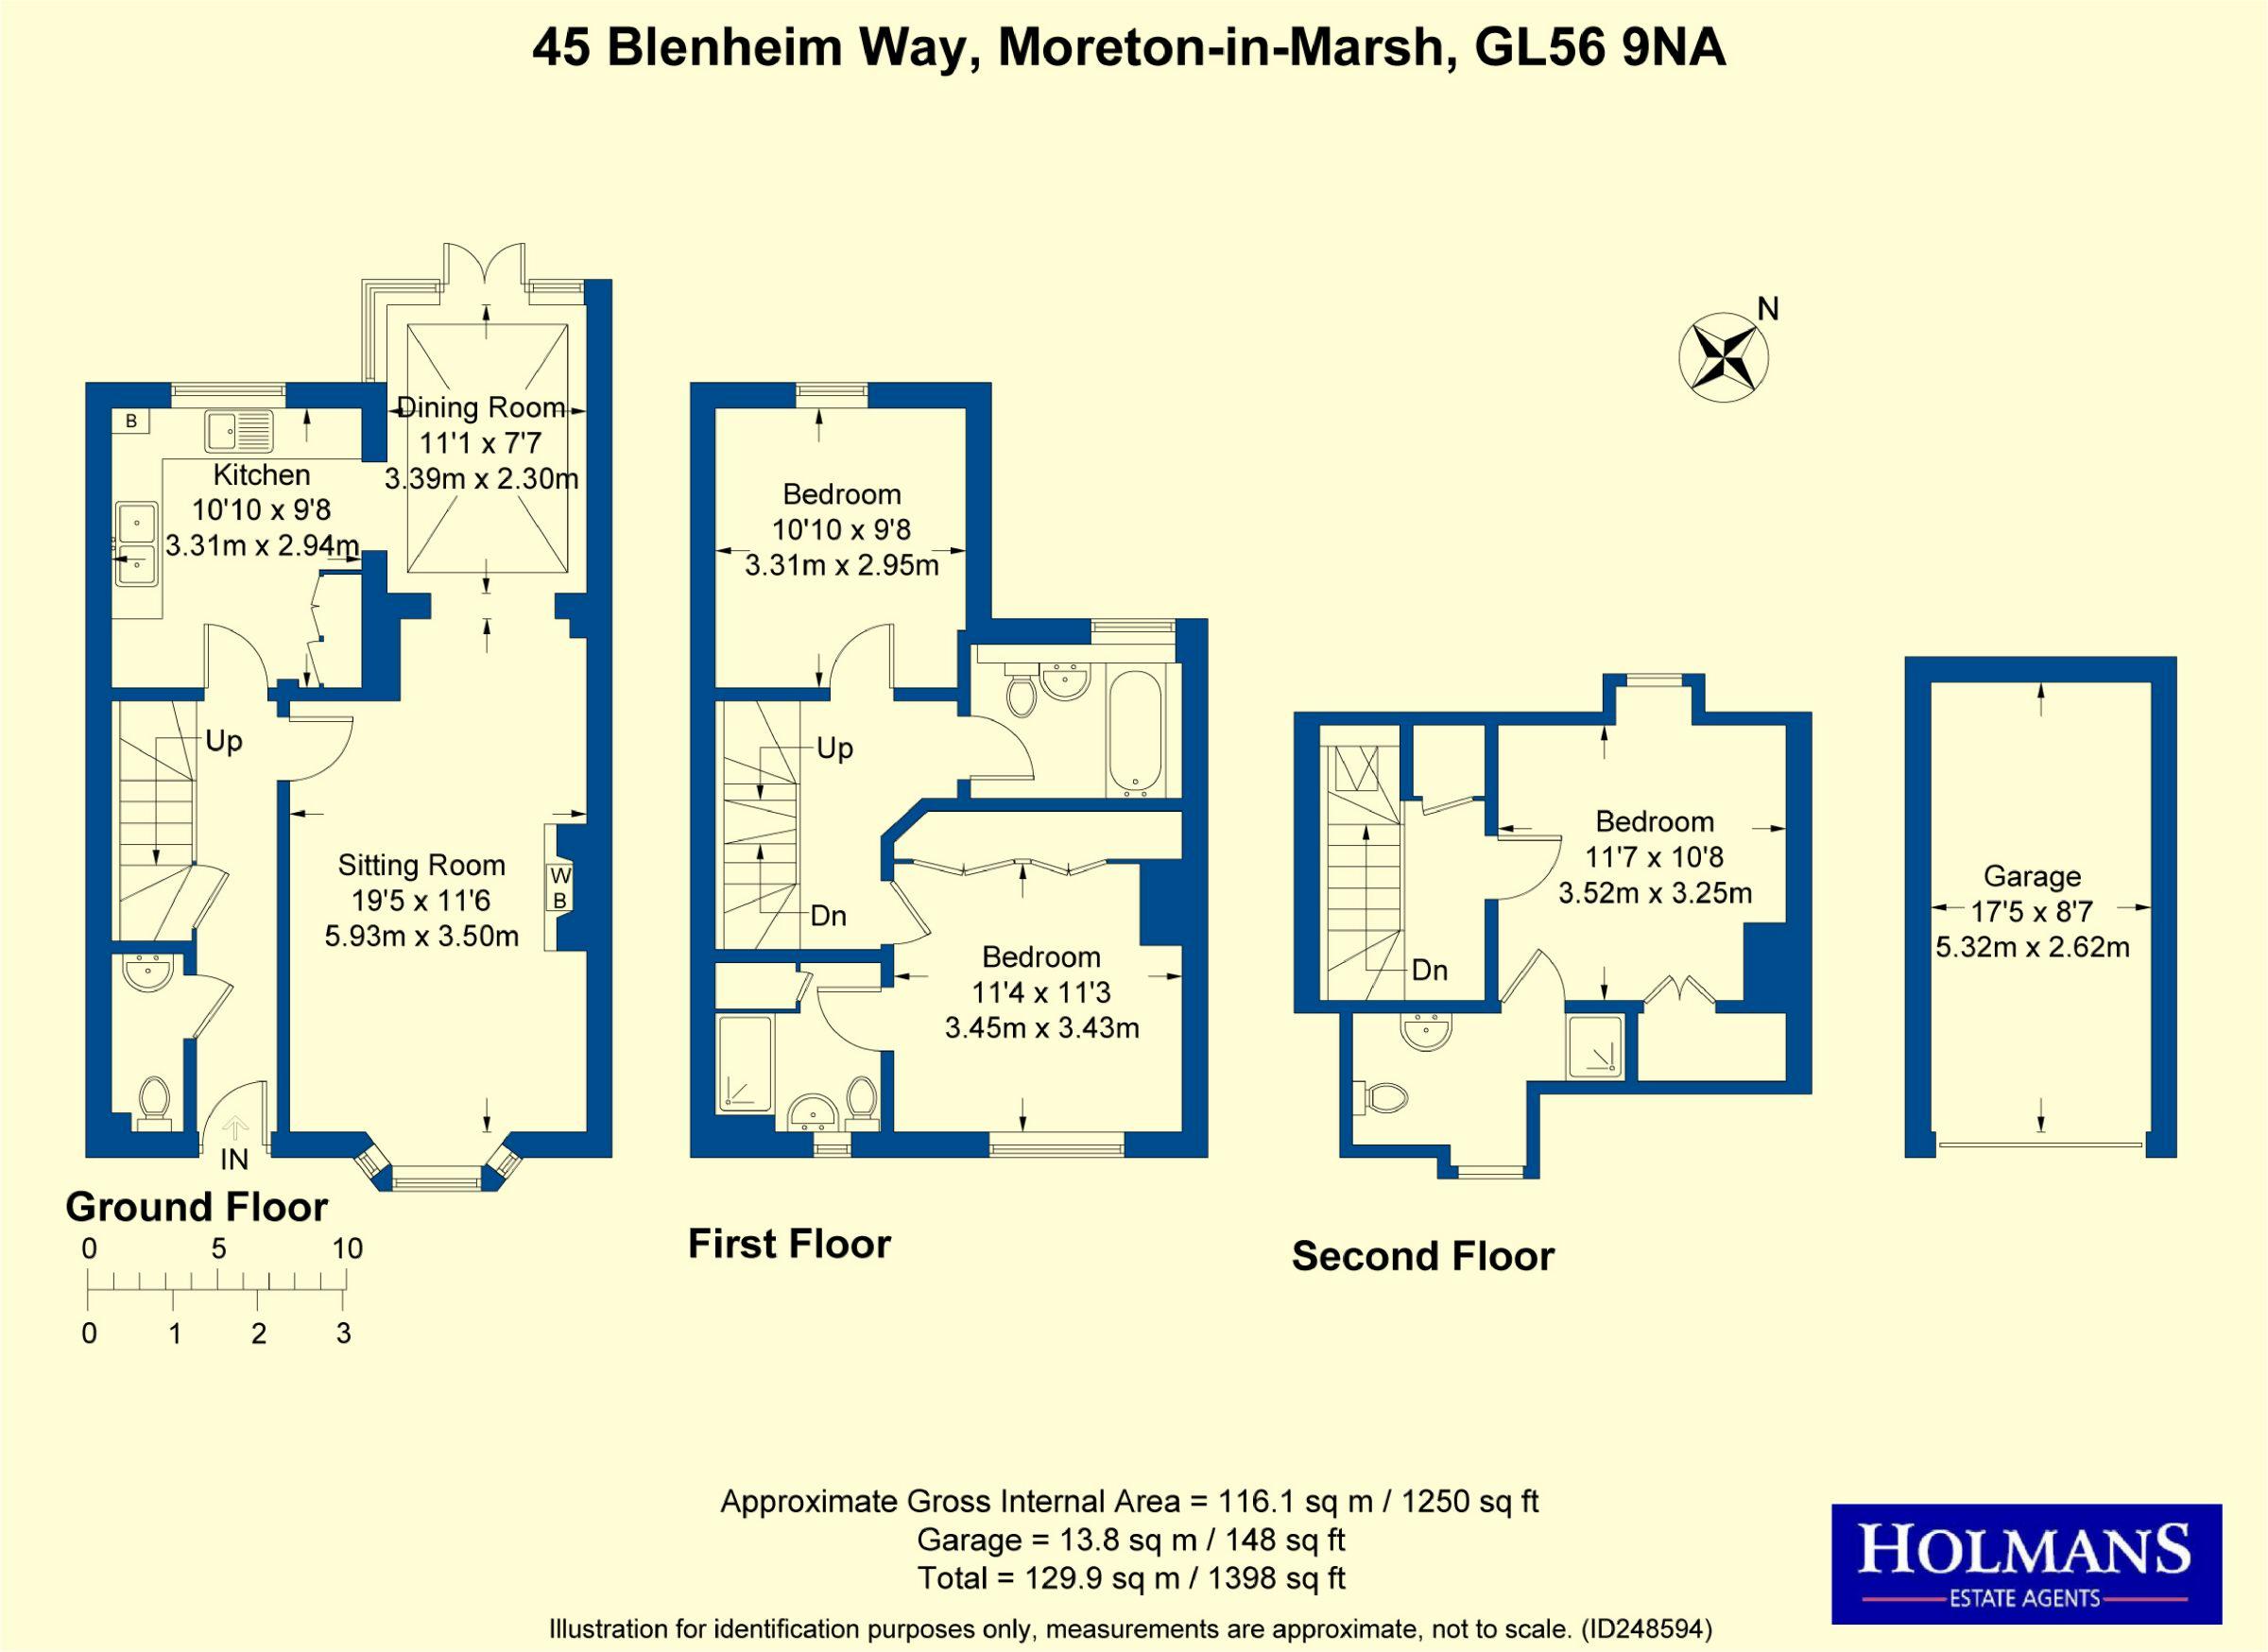 3 bedroom Terraced House for sale in Moreton-in-marsh